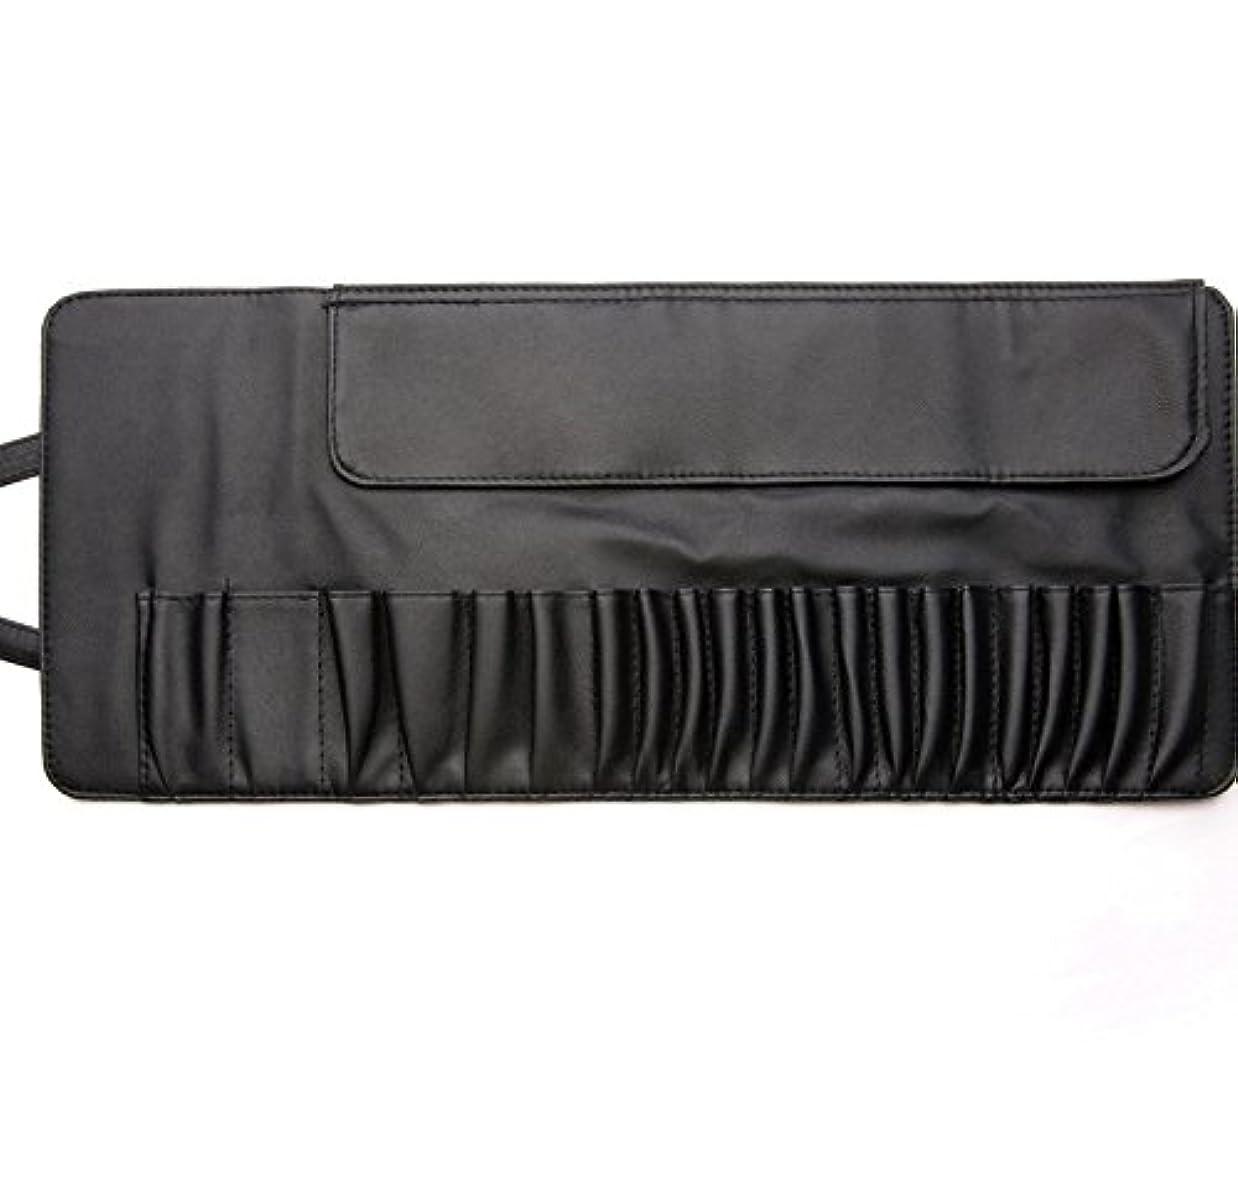 MakeupAcc メイクブラシケース 化粧筆収納ポーチ 高級PU 10本12本20本収納 (L) [並行輸入品]